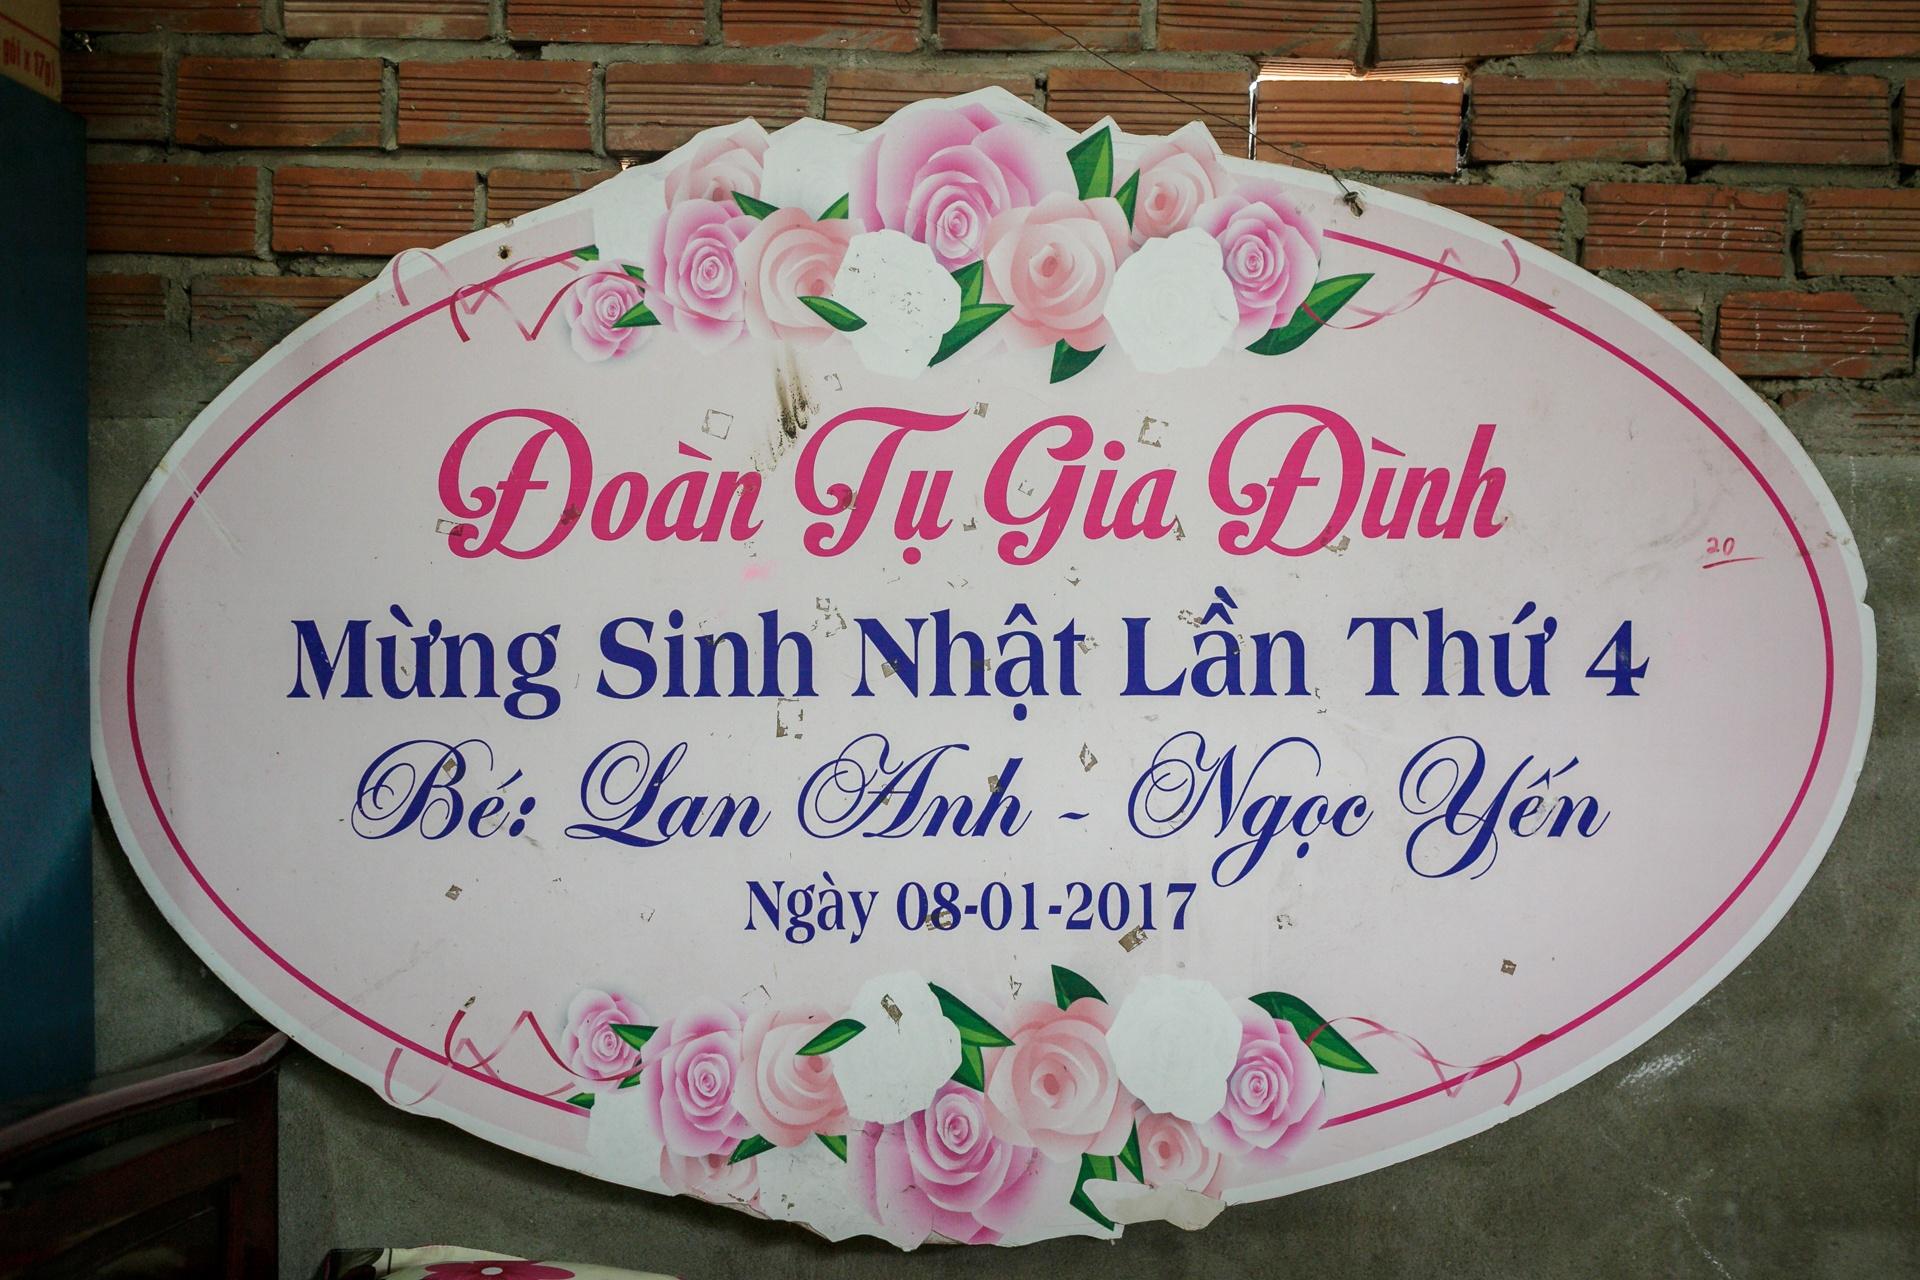 Hai nam sau cuoc tro ve cua be gai bi trao nham o Binh Phuoc hinh anh 2